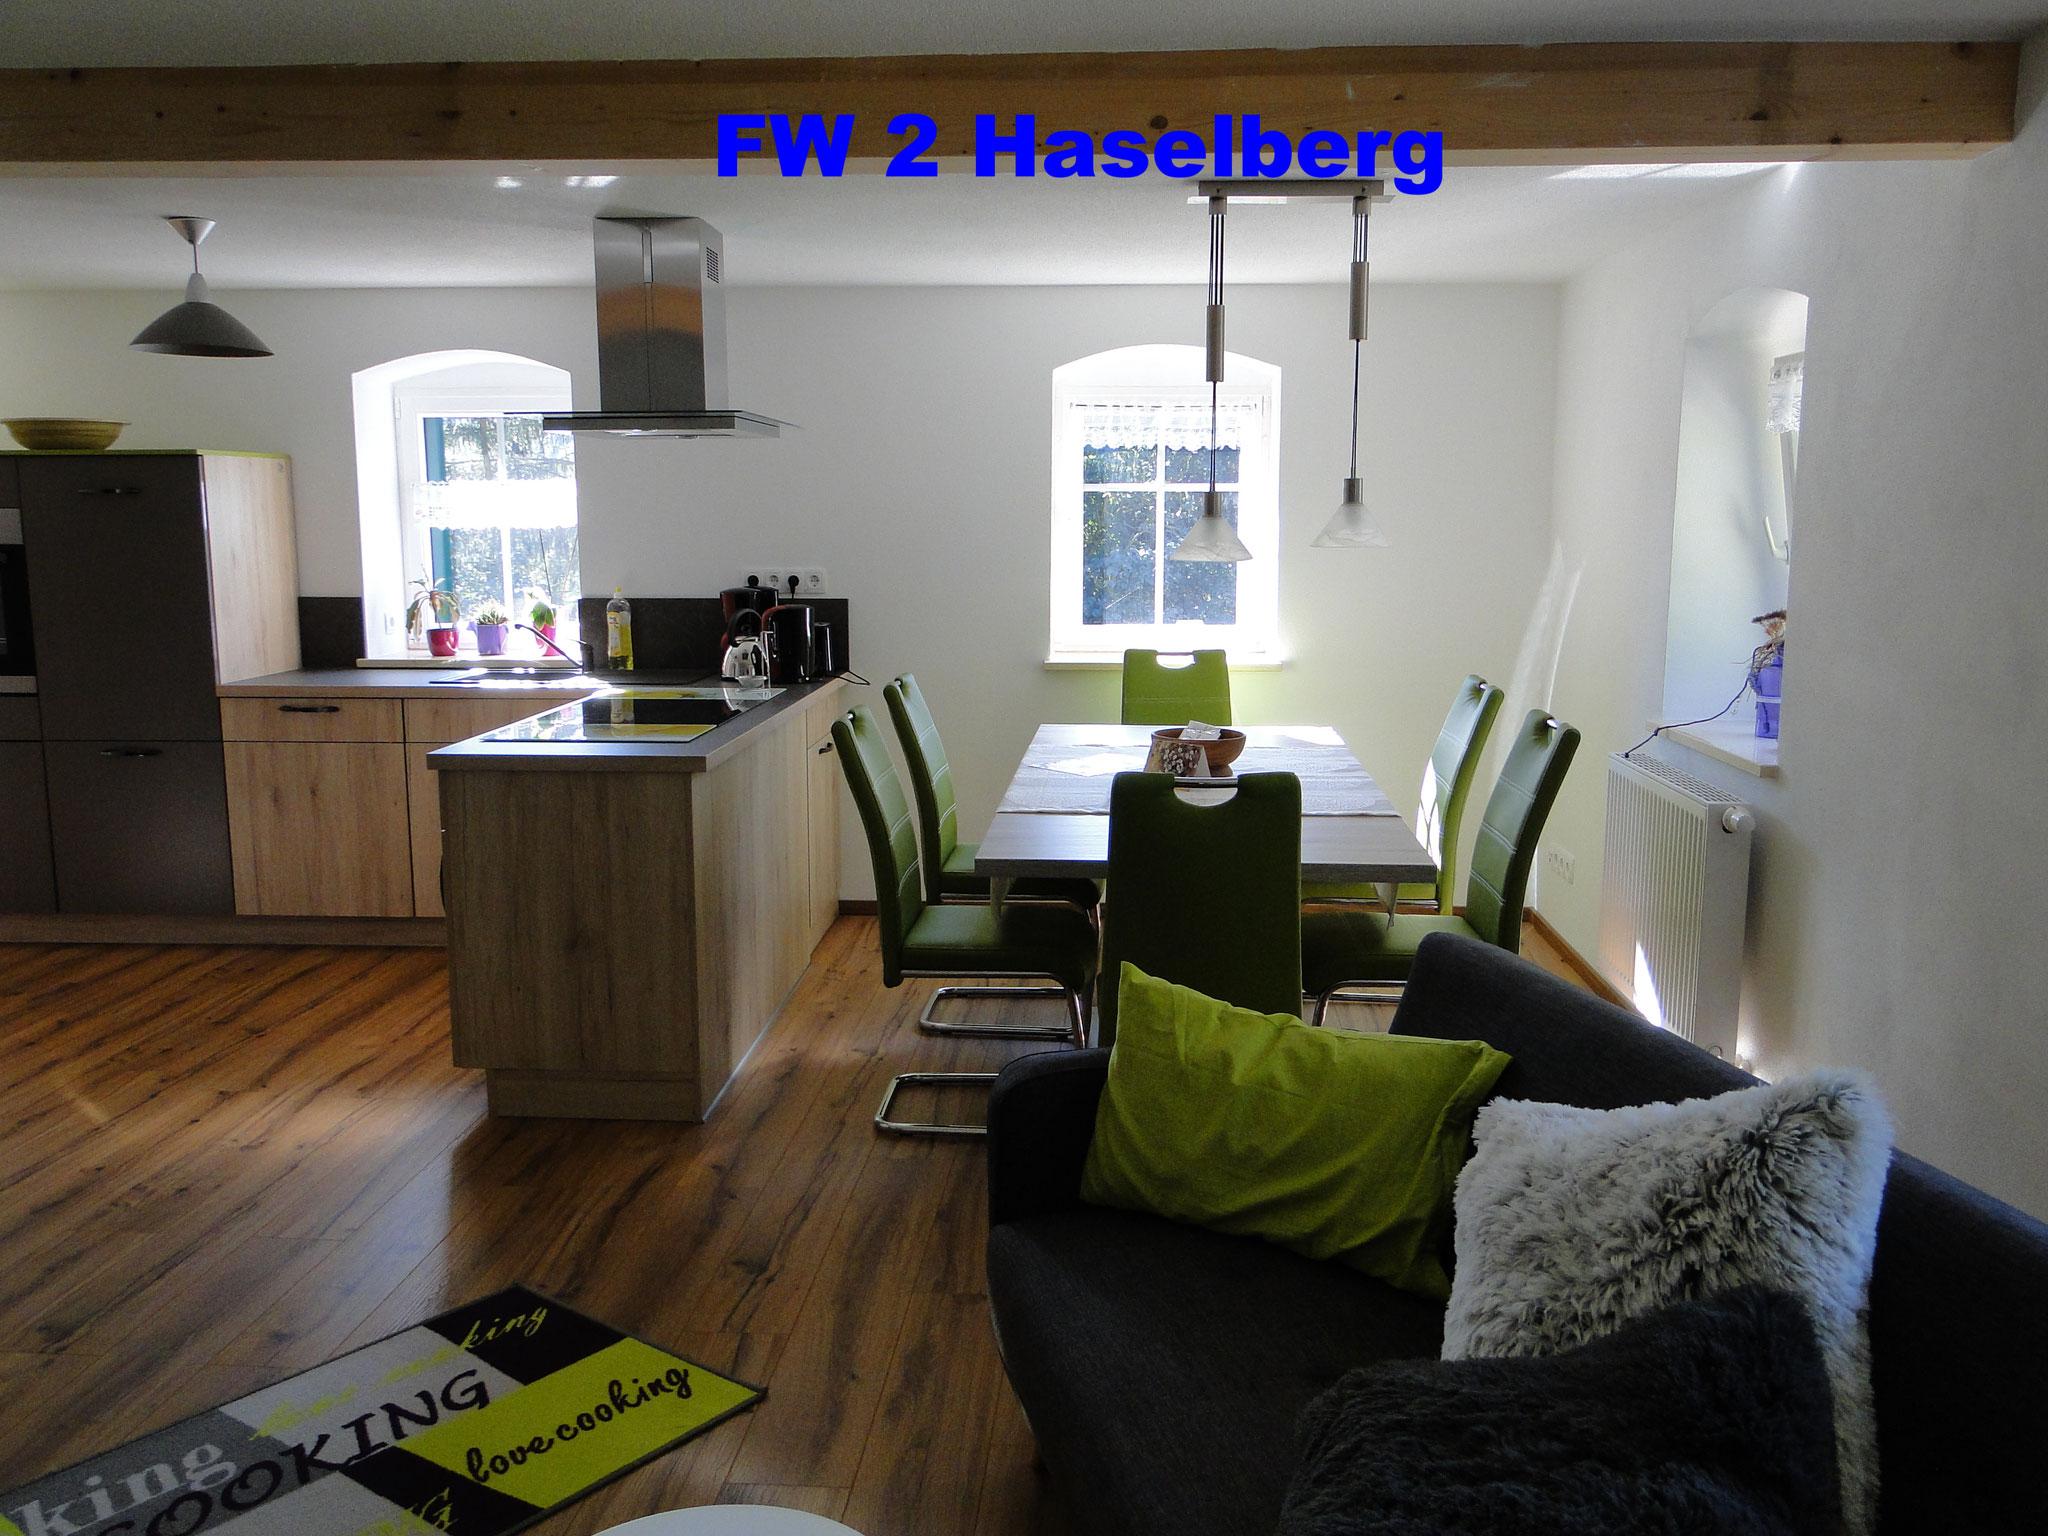 FW 2, Haselberg, Koch/- Wohnbereich